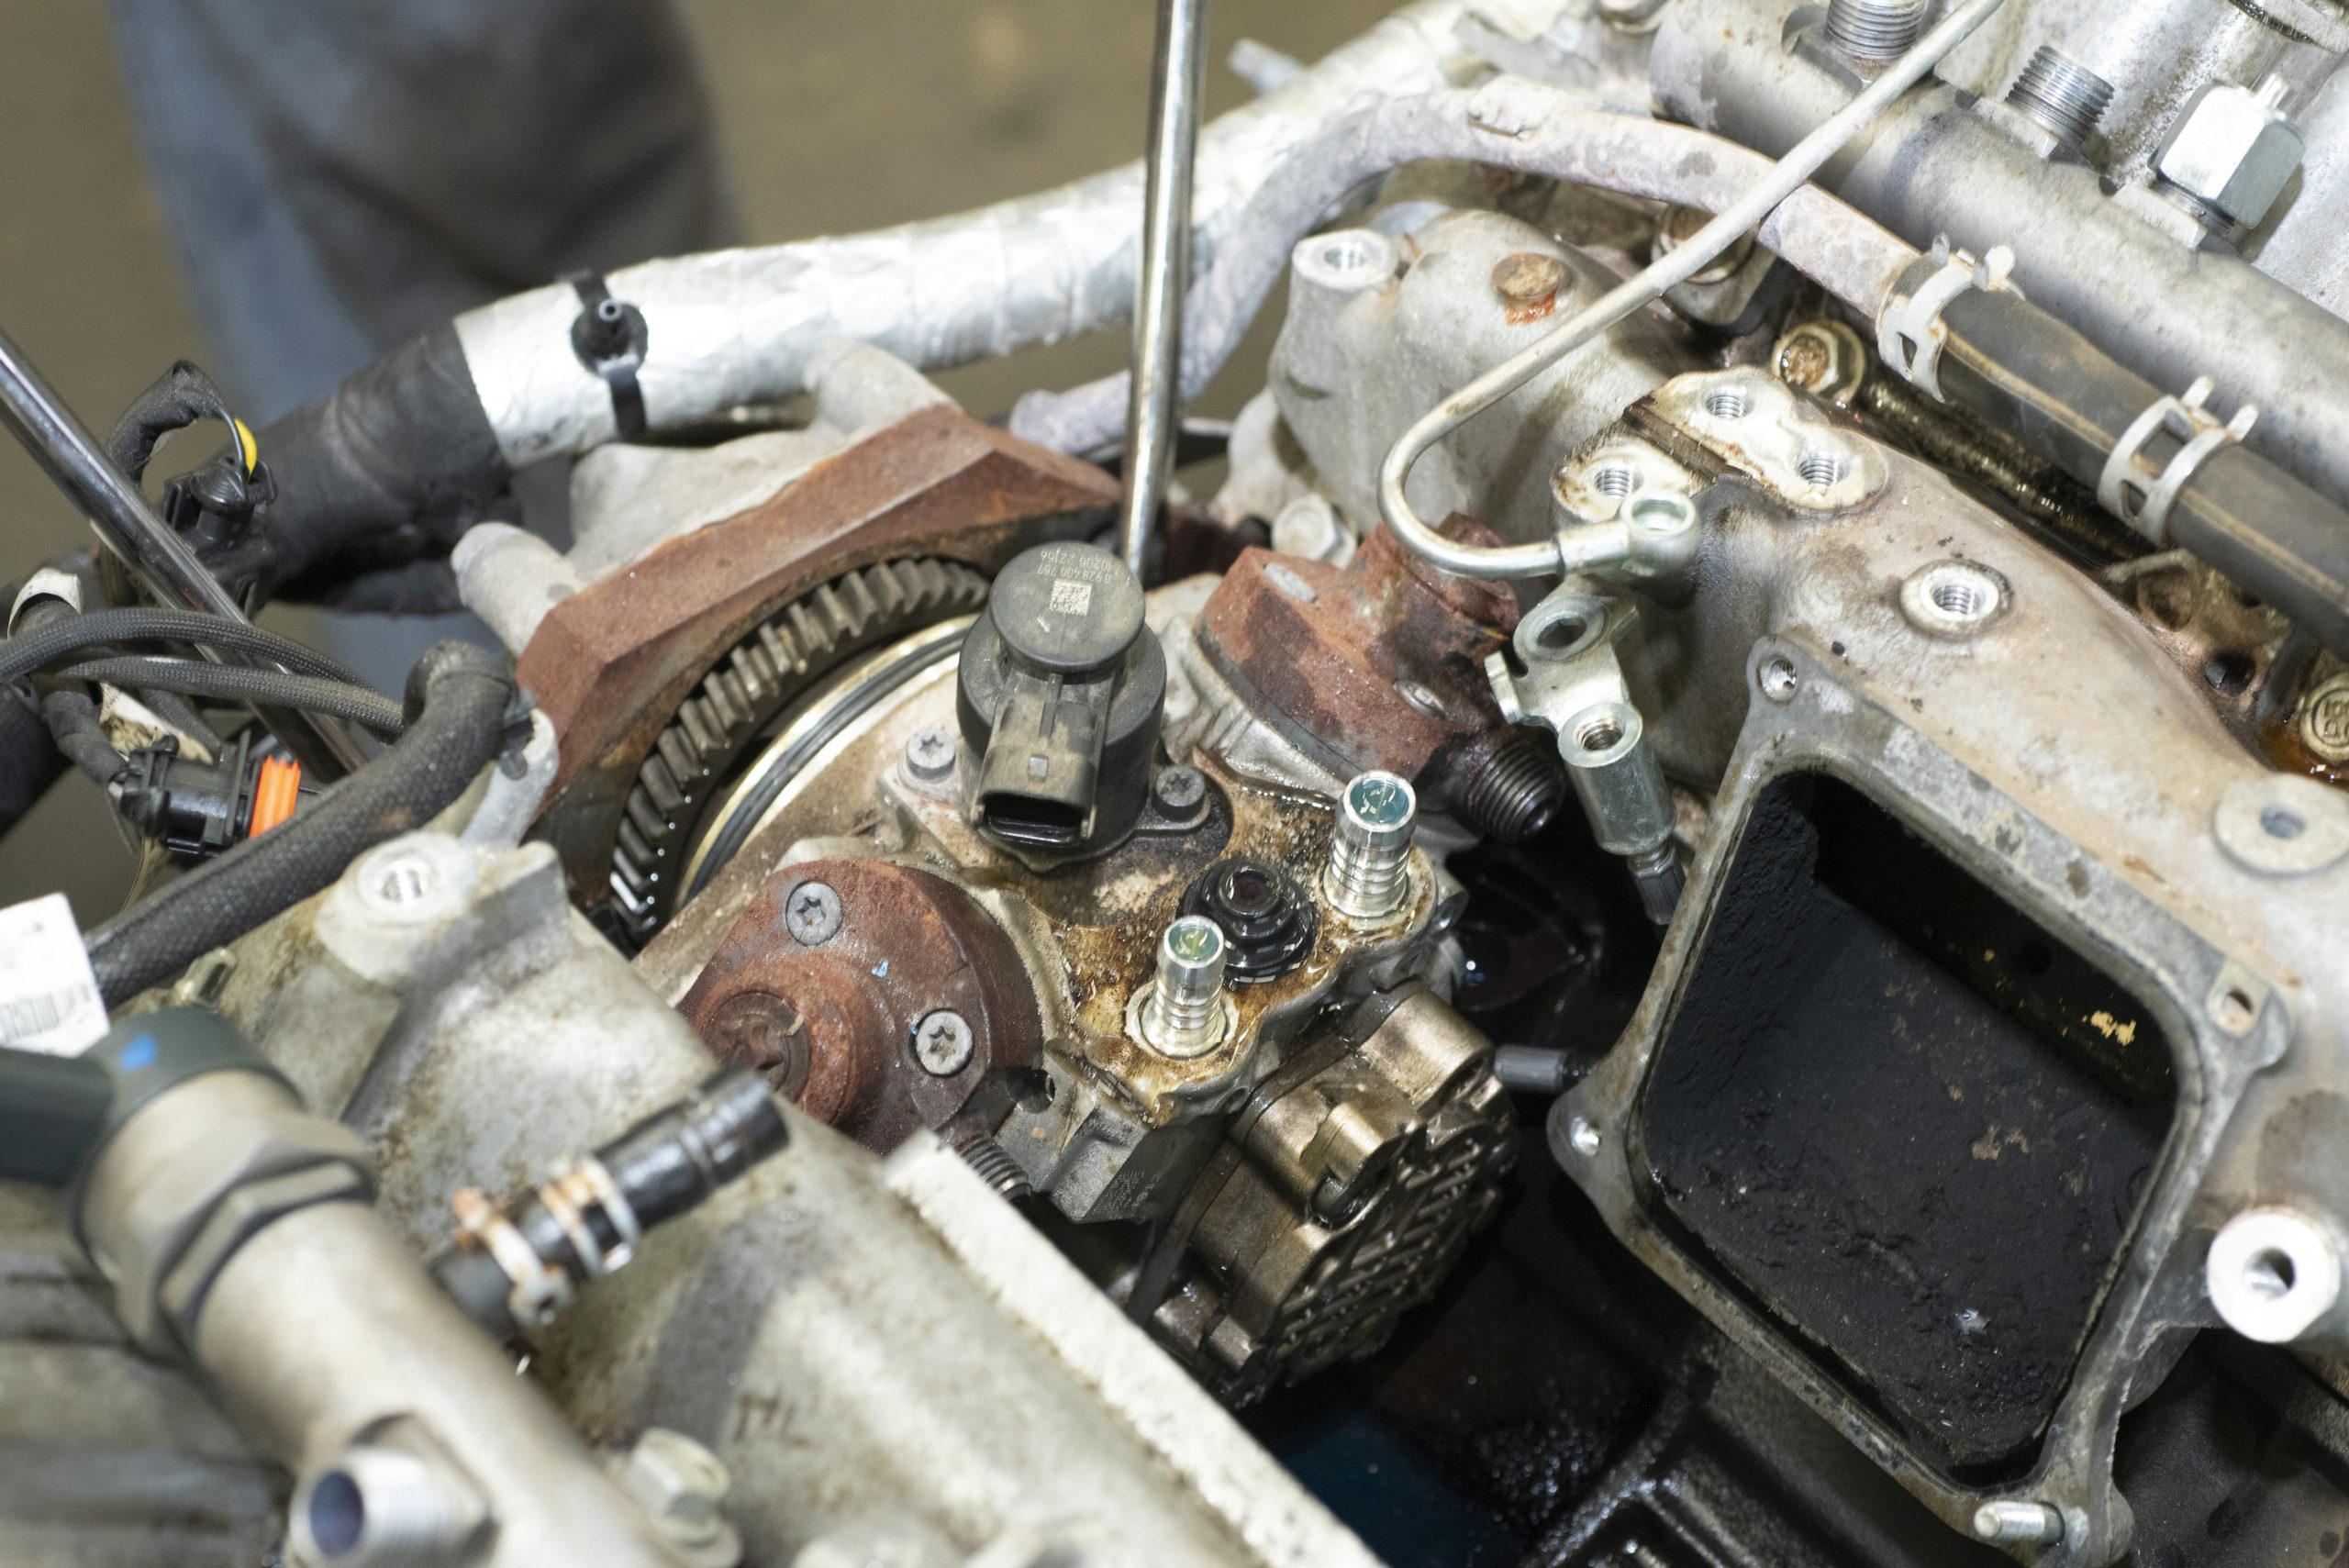 Bosch CP4.2 high-pressure fuel-injection pump